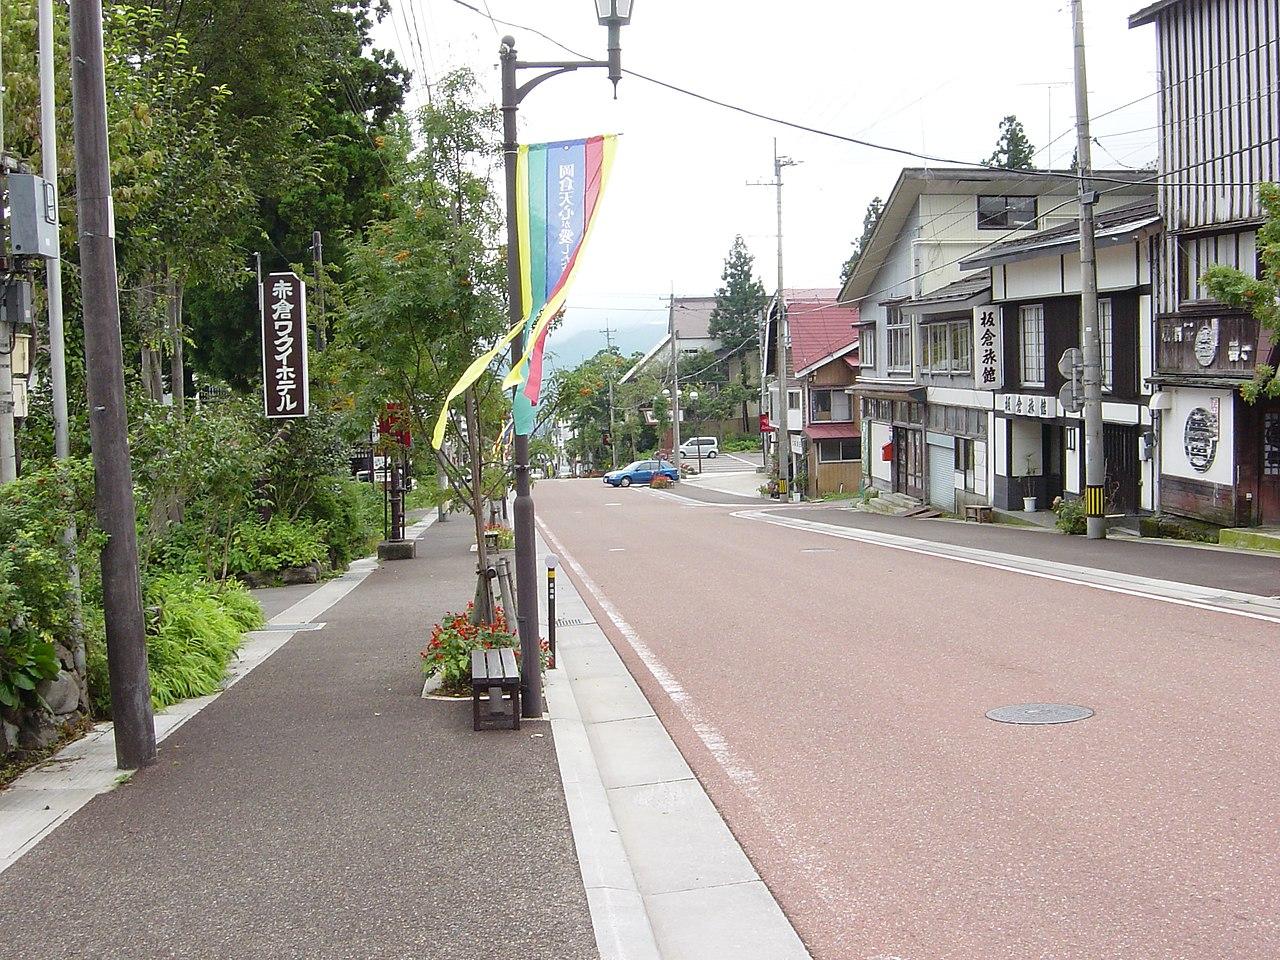 赤倉温泉街 - panoramio.jpg